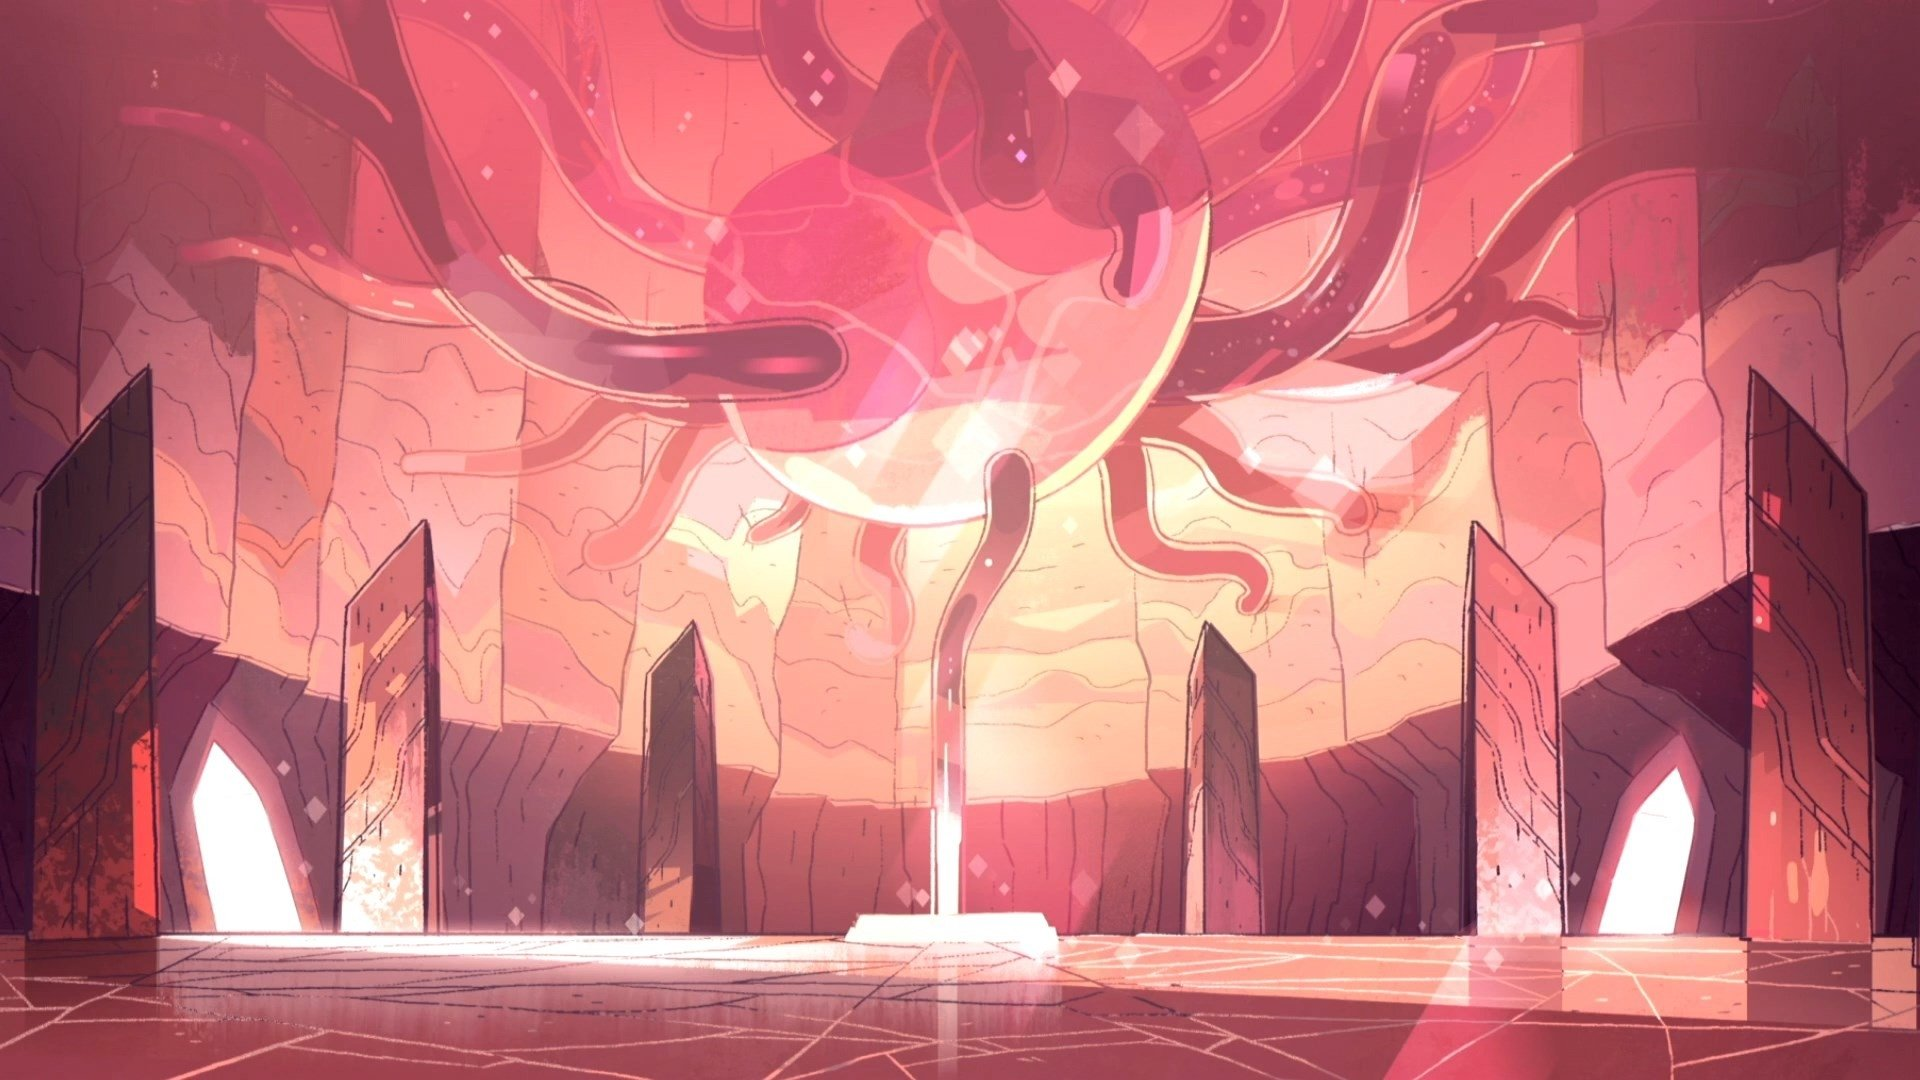 Steven Universe Wallpaper Full HD